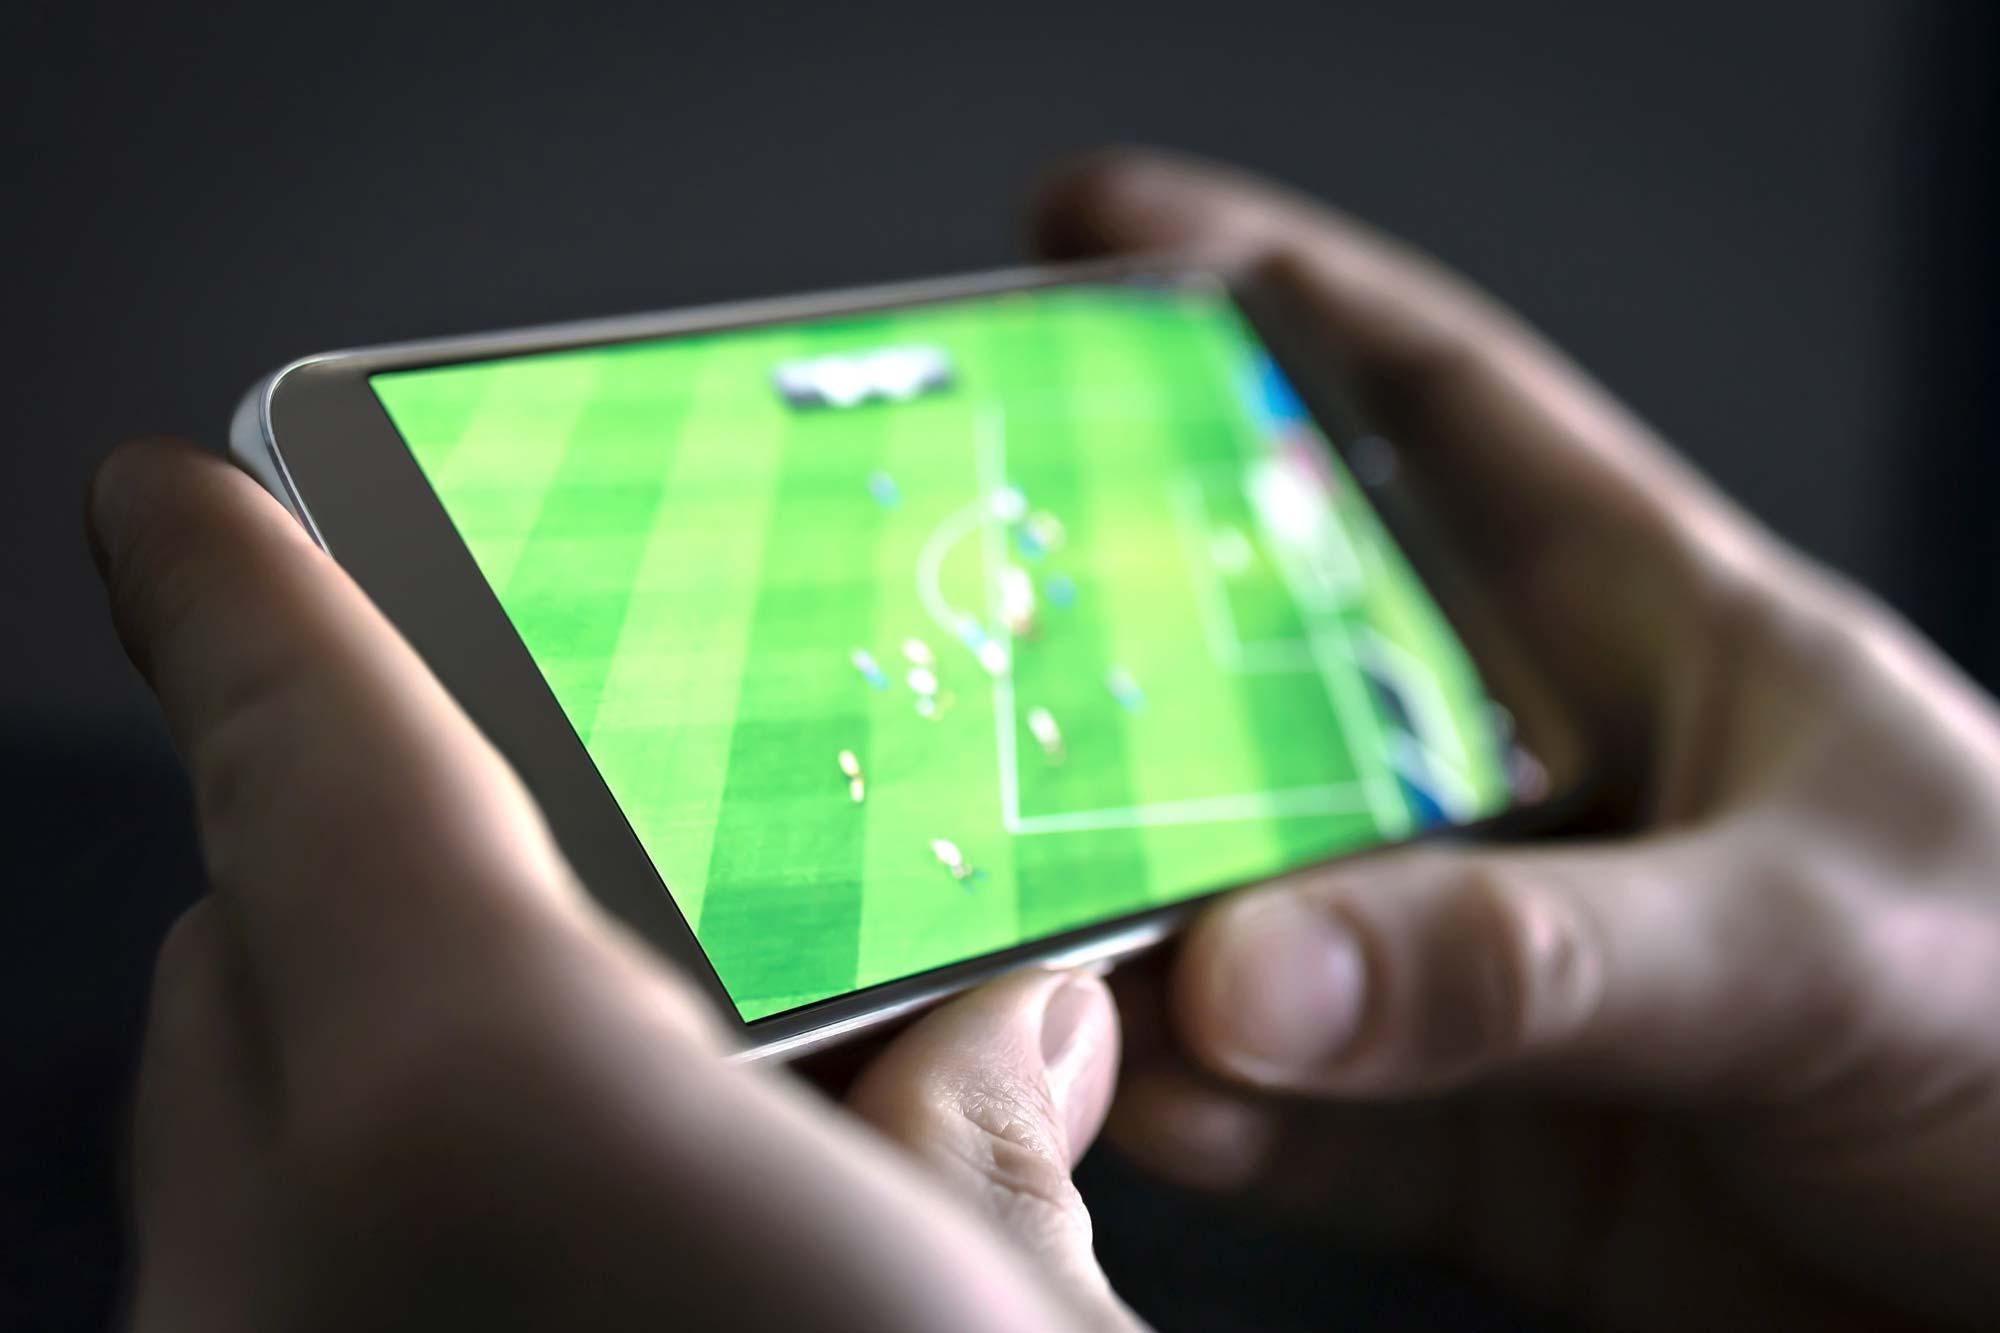 aplicacion para ver futbol gratis